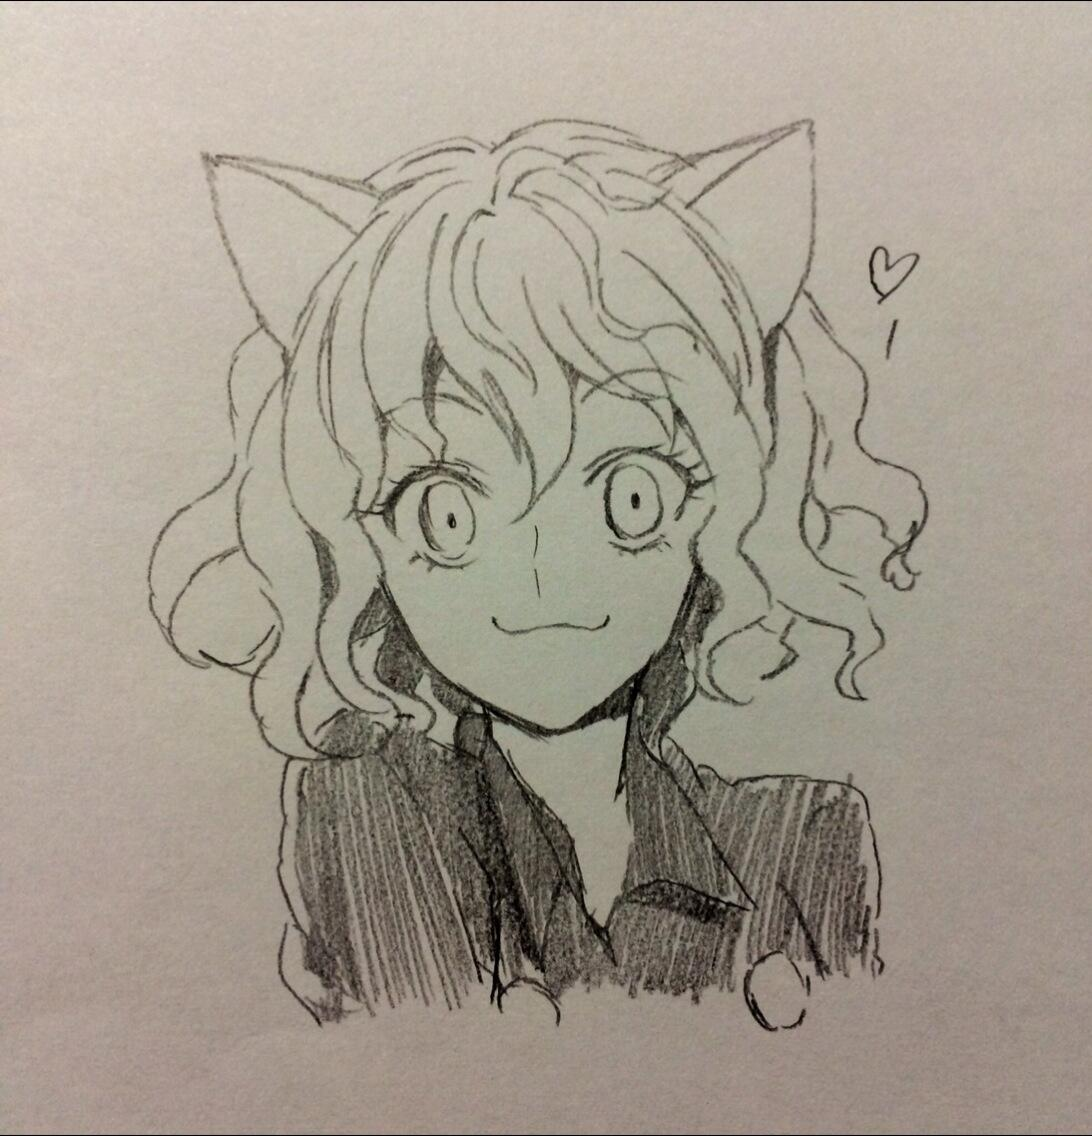 kawabe_kon : ネフェルピトー可愛い http://t.co/9NzHYxYrDb   Twicsy - Twitter ...